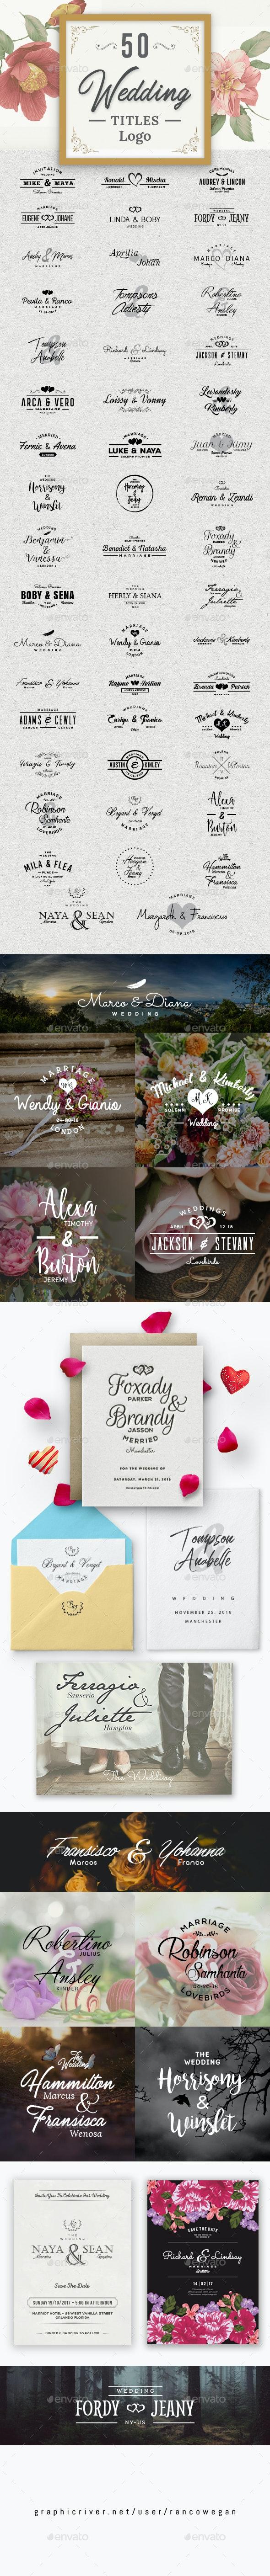 50 Wedding Titles Logo - Badges & Stickers Web Elements